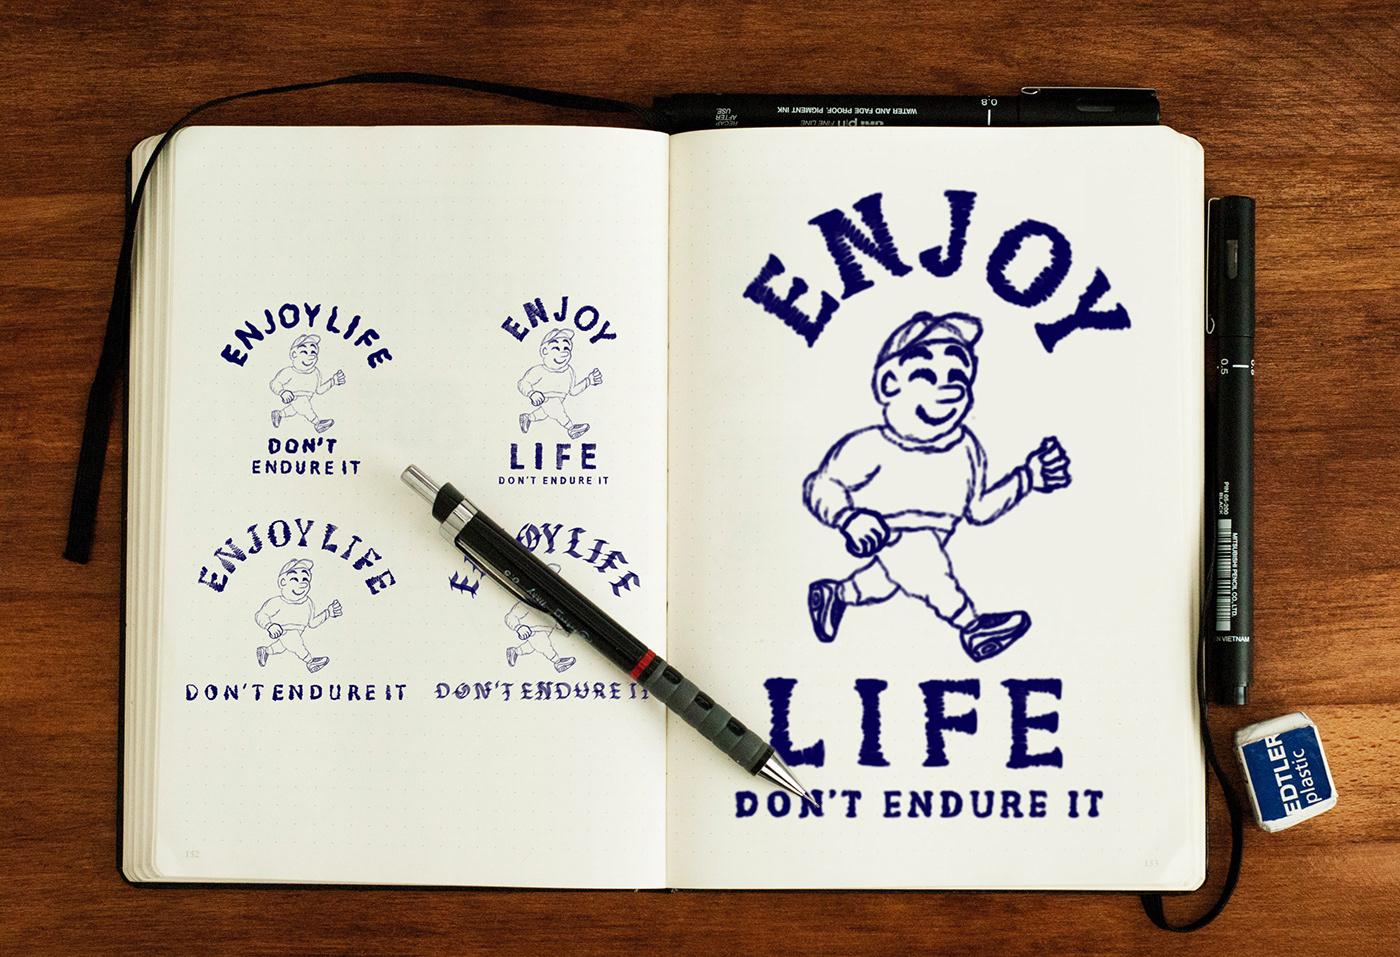 Image may contain: cartoon, indoor and handwriting